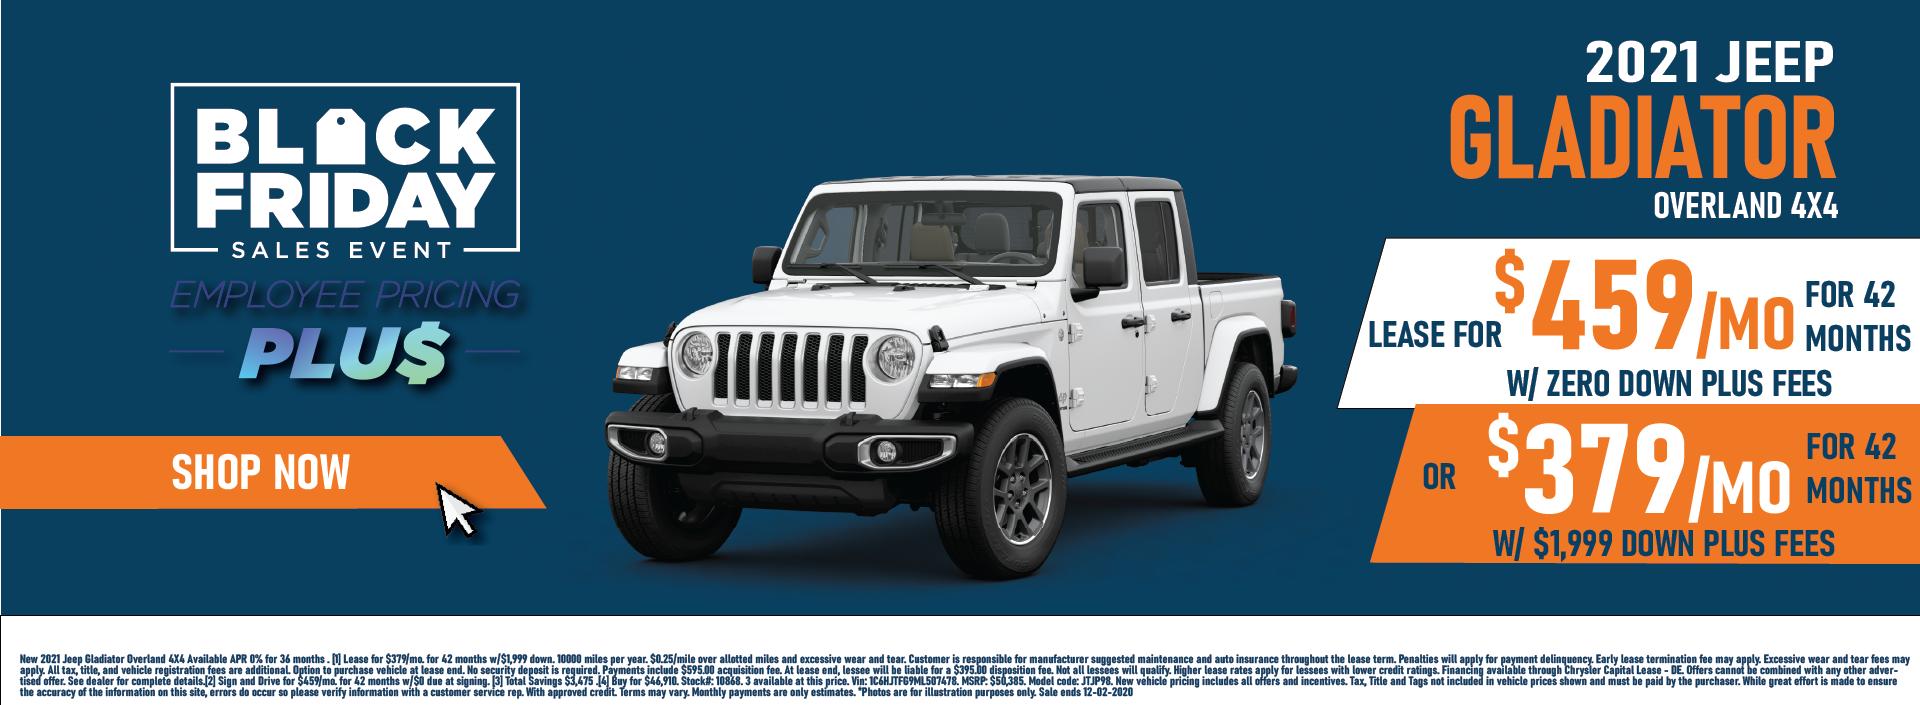 Whitewater – Jeep Gladiator November Updated